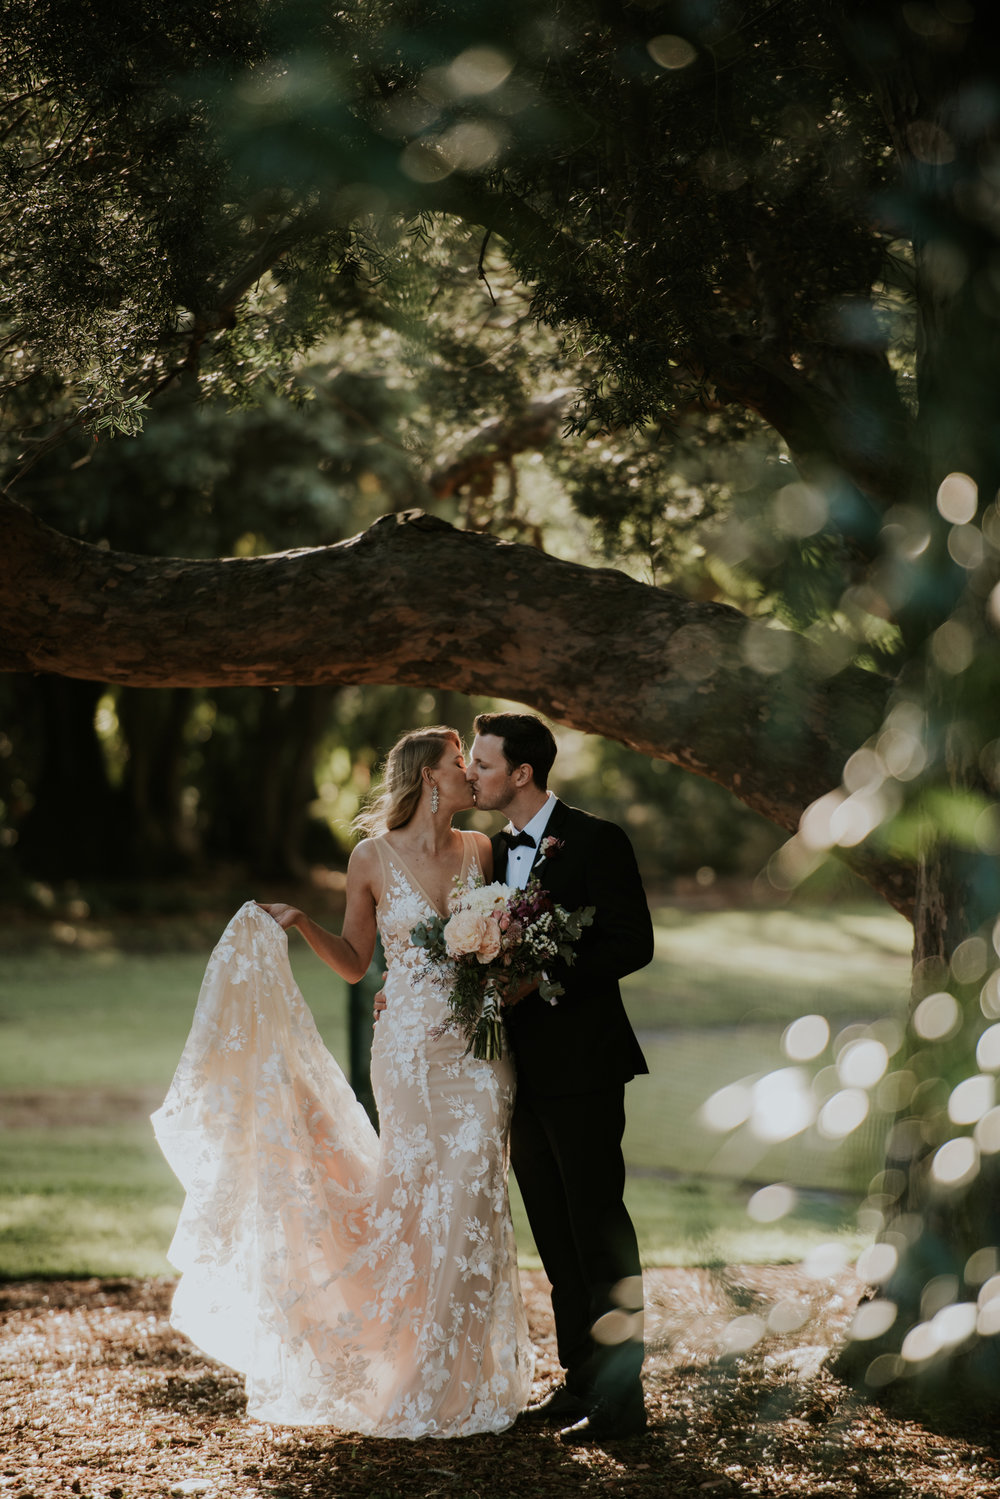 Brisbane Wedding Photographer | Engagement-Elopement Photography | Factory51-City Botantic Gardens Wedding-45.jpg